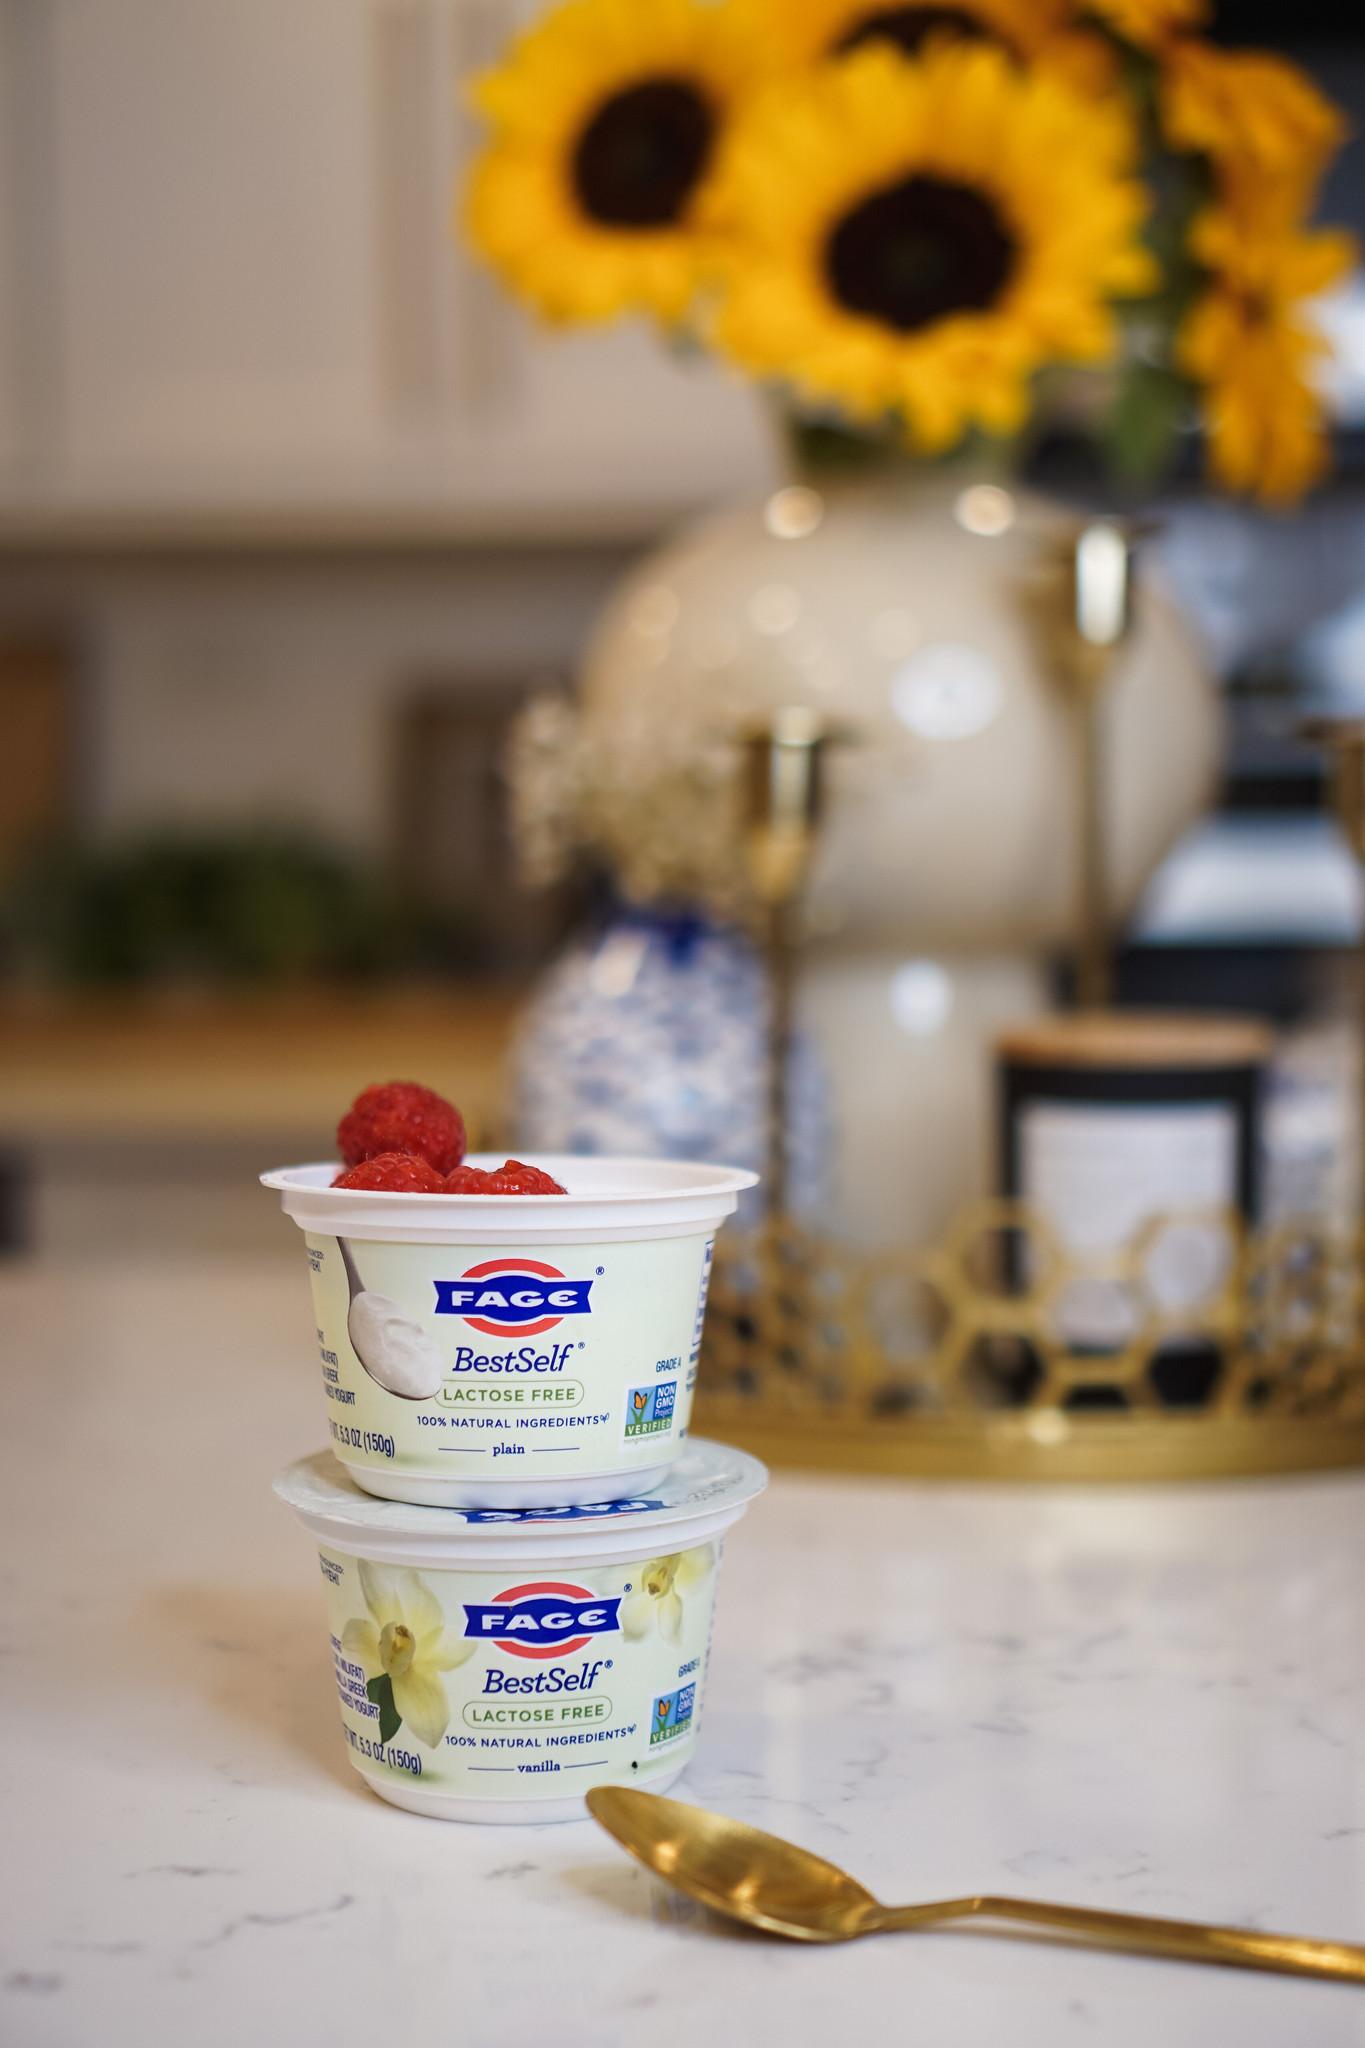 Lactose Free Yogurt | Lactose Free Greek Yogurt | Best Lactose Free Yogurt